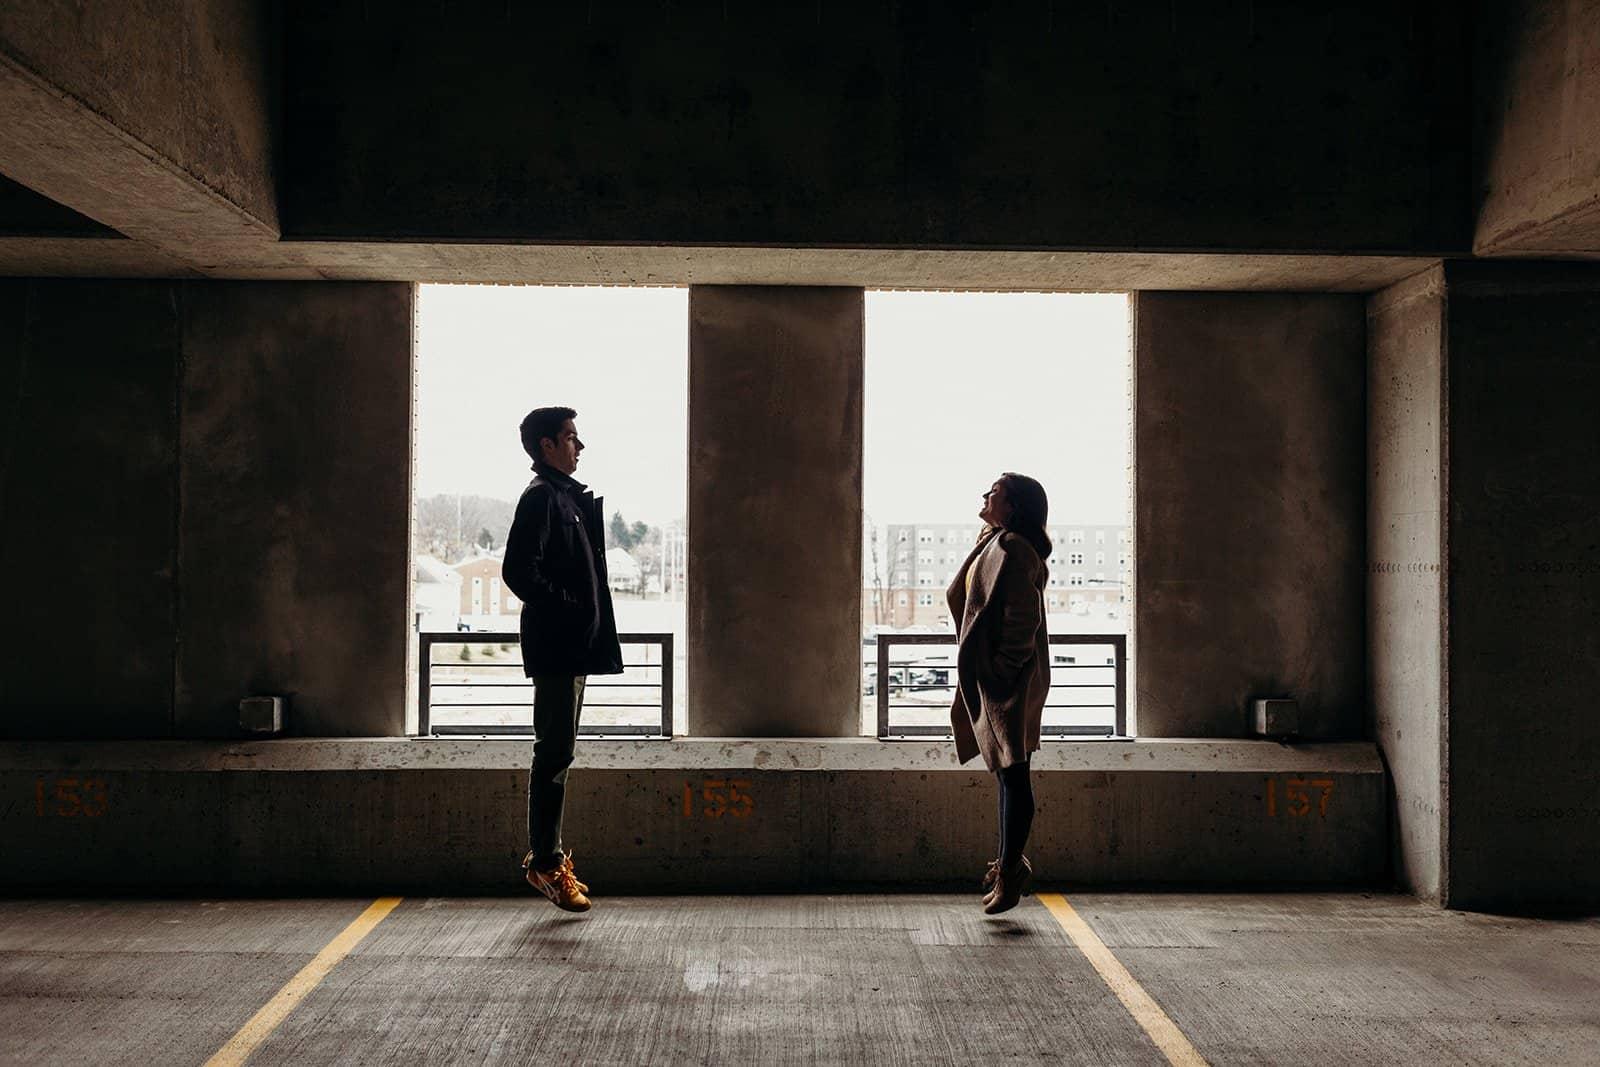 Kent Ohio Engaged couple jumping in parking garage